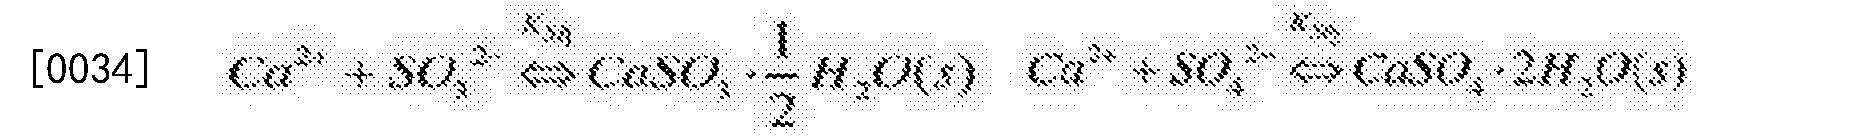 Figure CN107321149AD00063